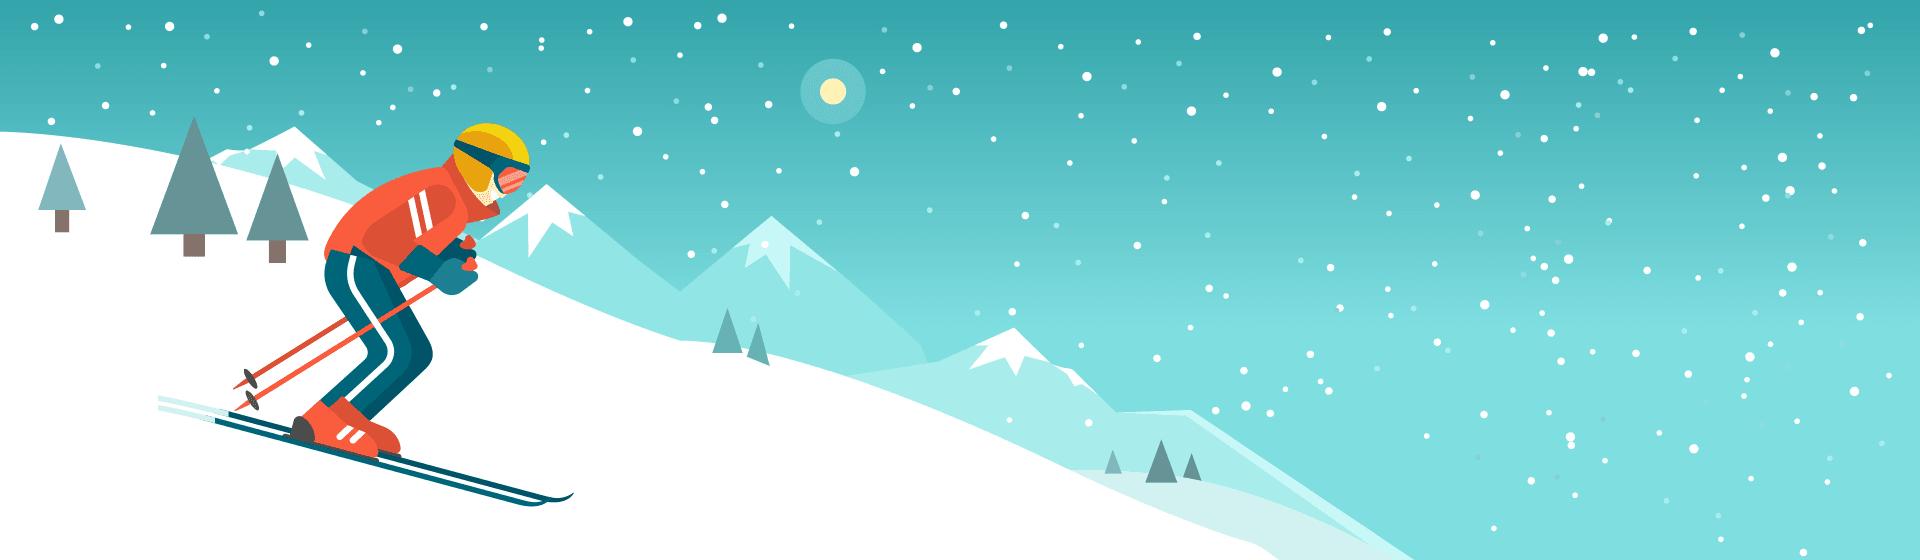 Clases de Esquí Particulares